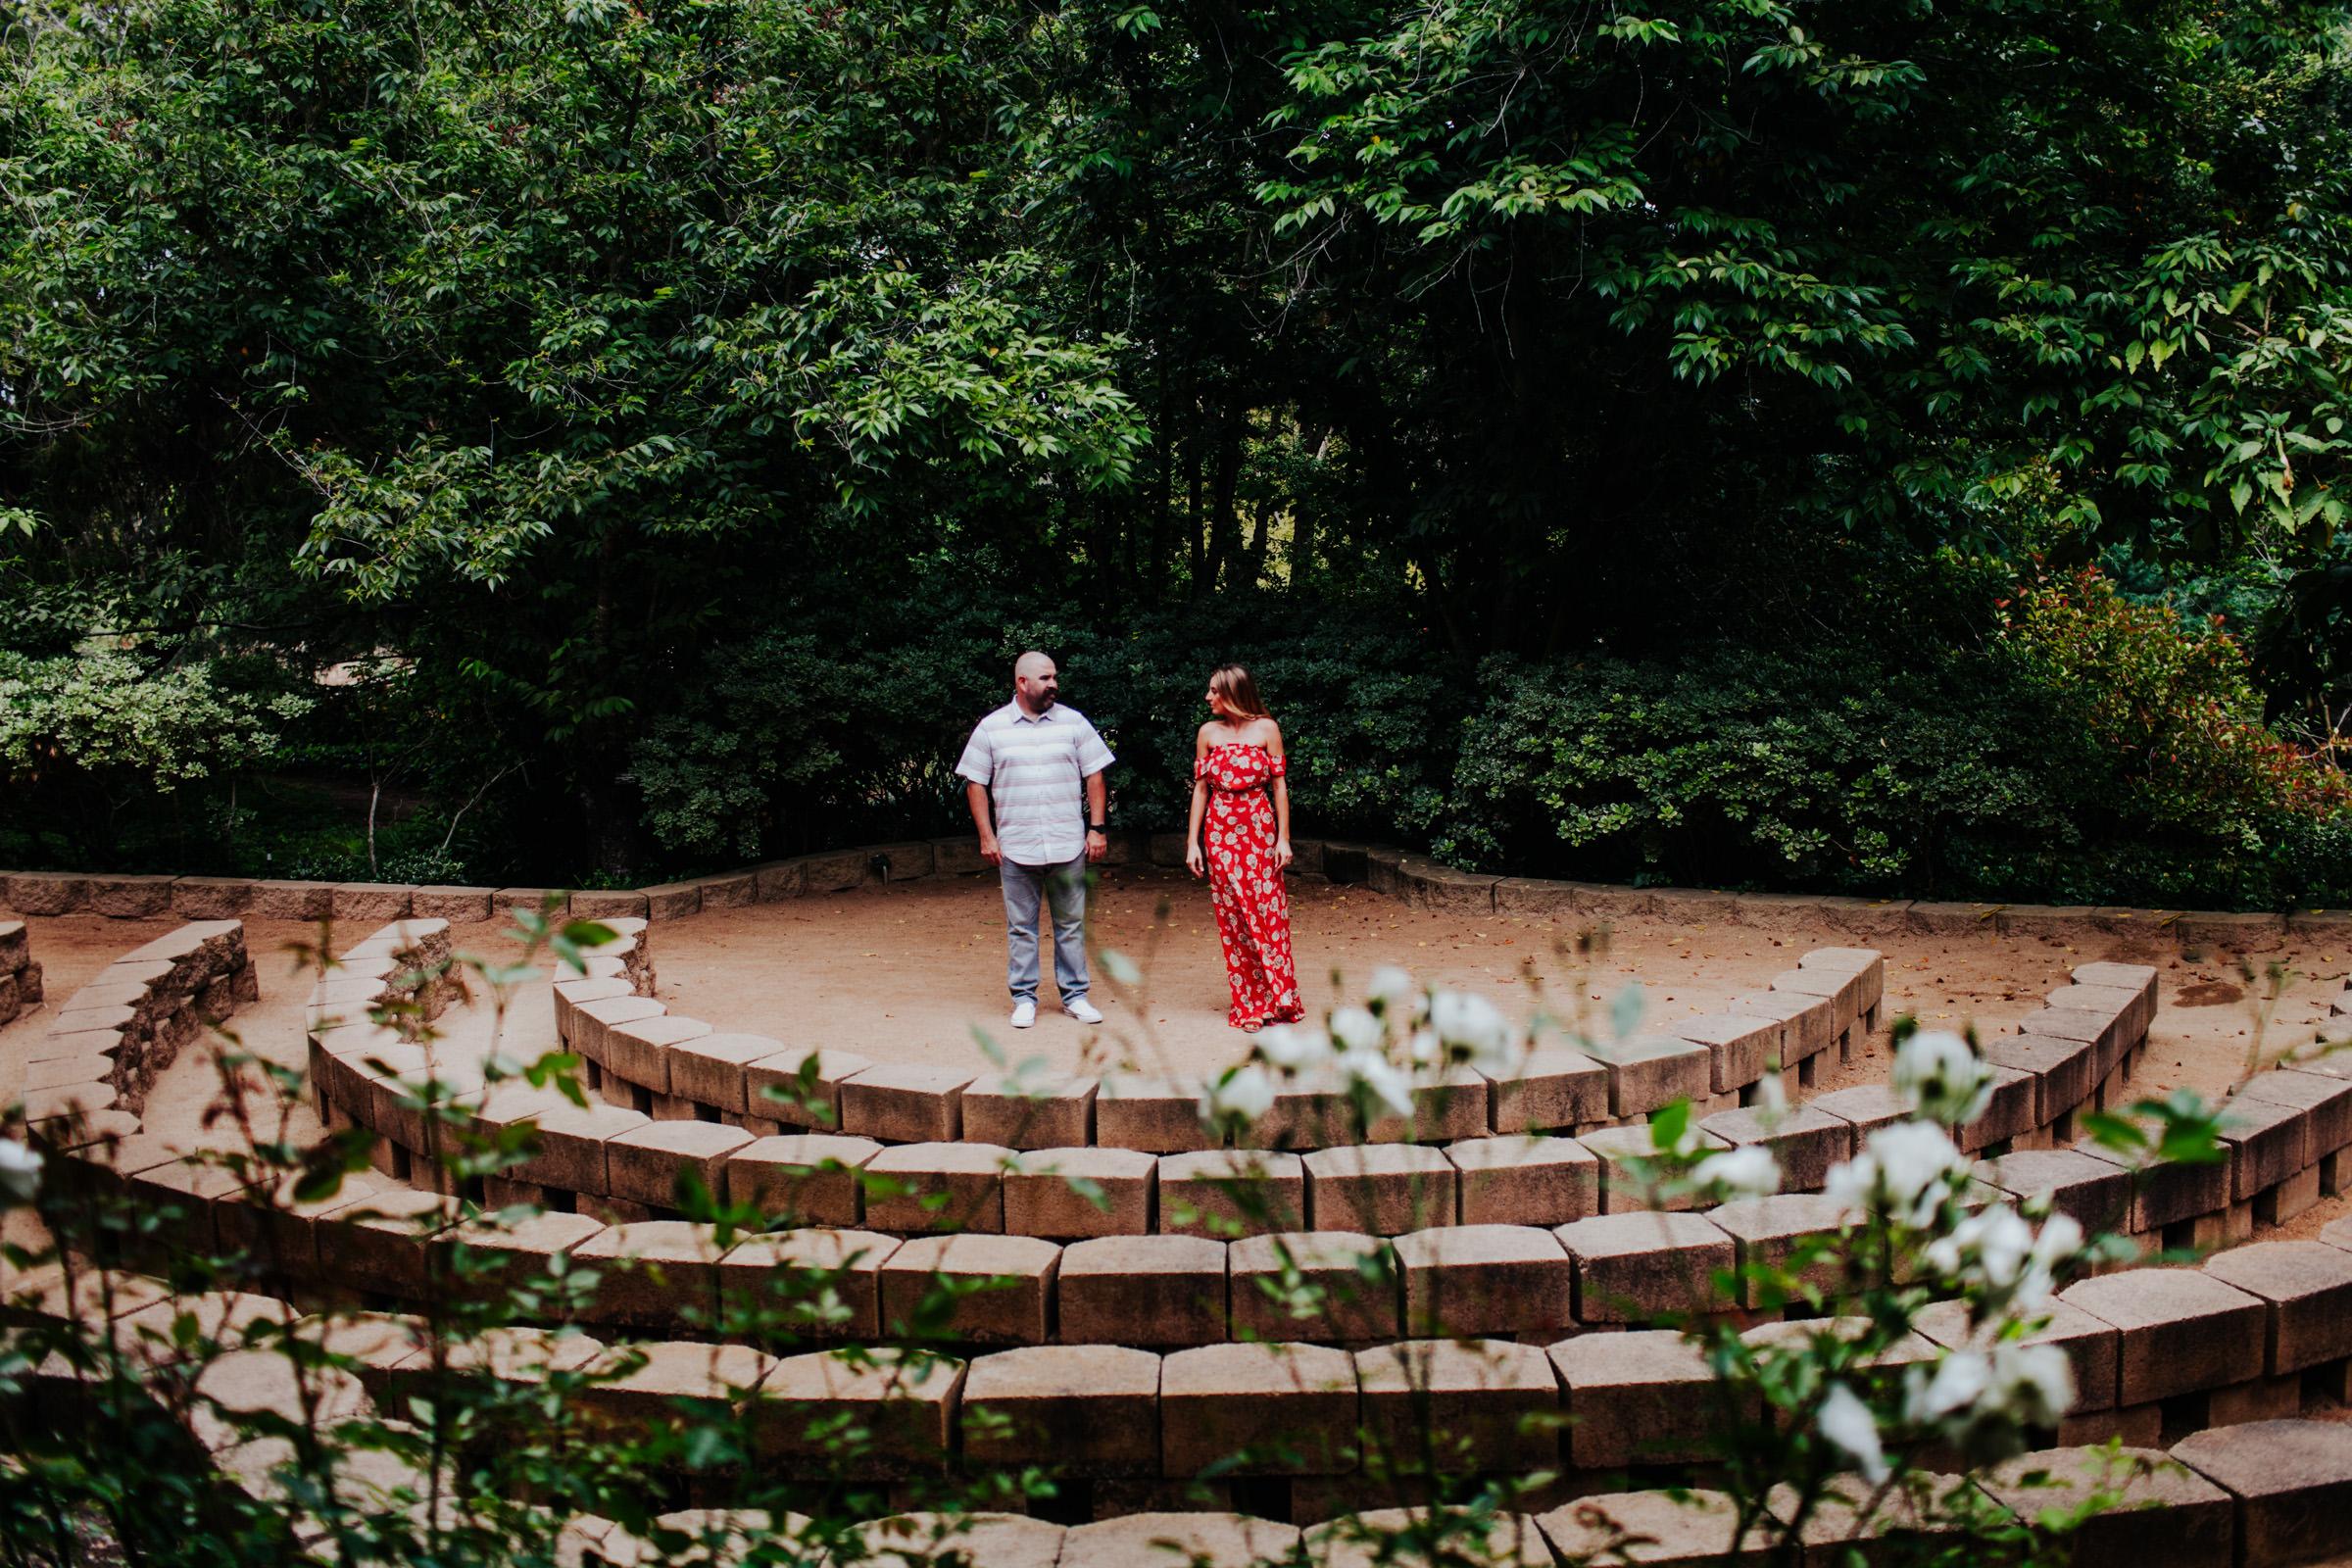 terranea-resort-palos-verdes-california-wedding-photography-cove-los-angeles-pierce-69.jpg